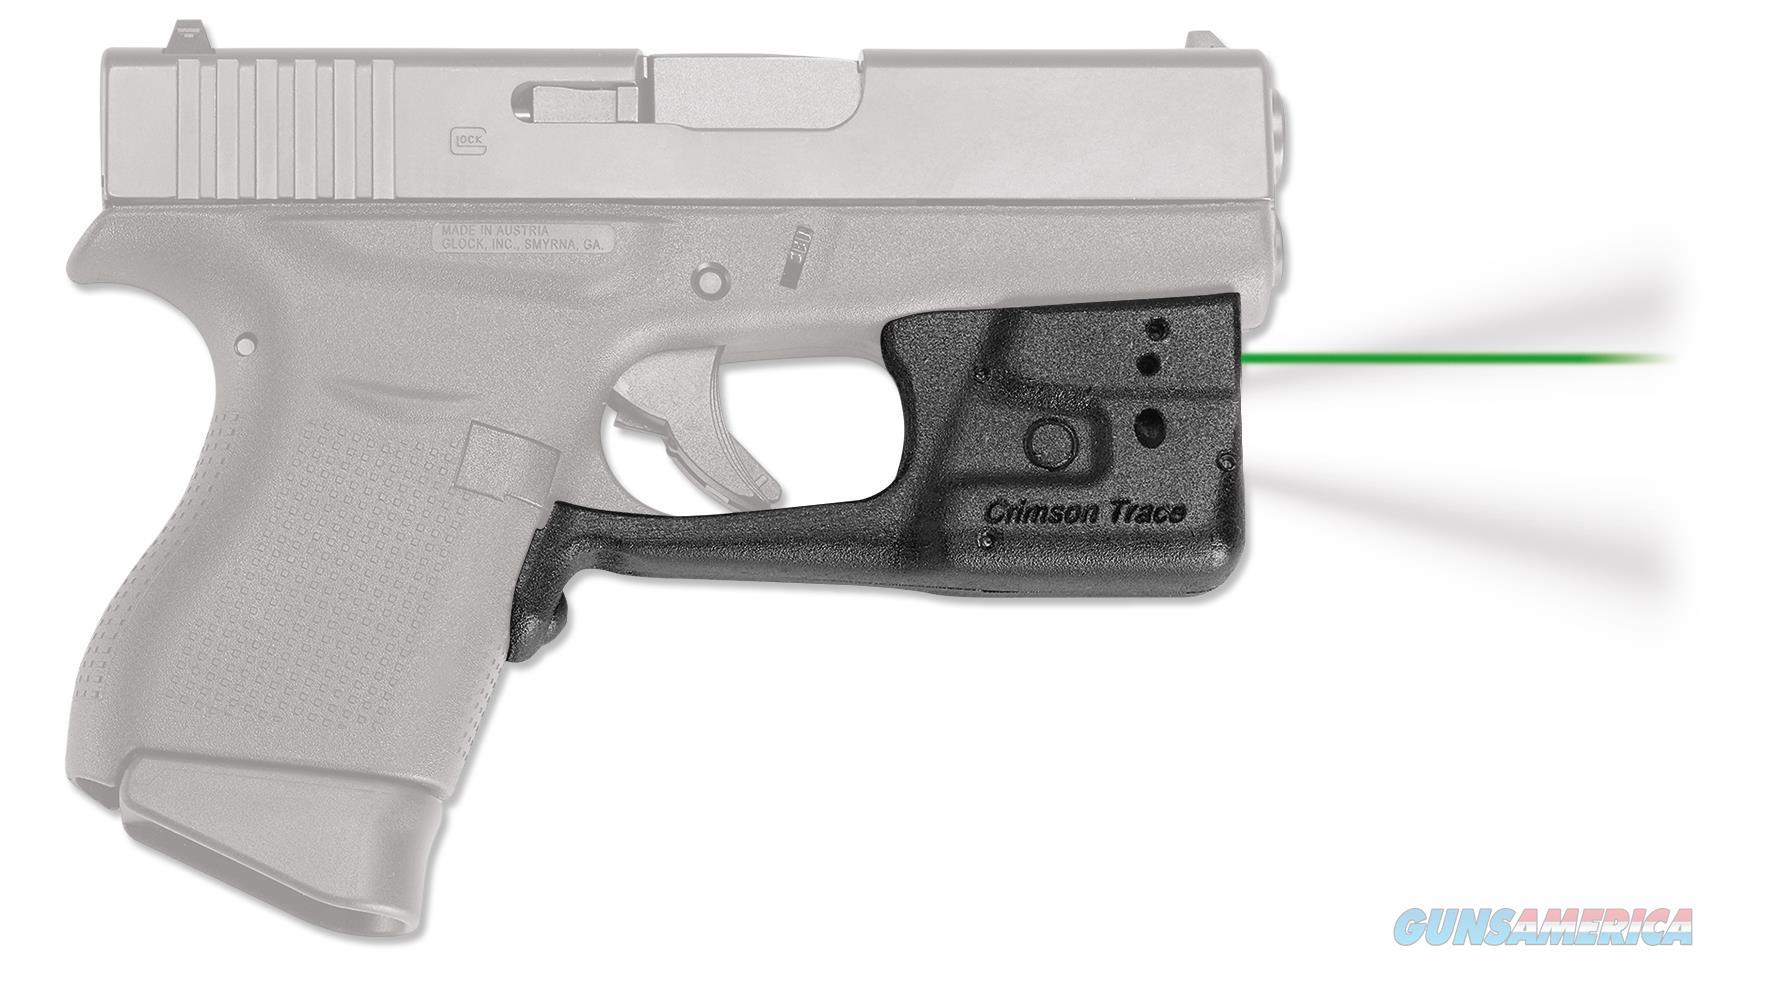 Crimson Trace Ll803ghbt Laserguard Pro Glock 42/43 With 43 Holster Green Laser Trigger Guard LL803GHBT  Non-Guns > Iron/Metal/Peep Sights